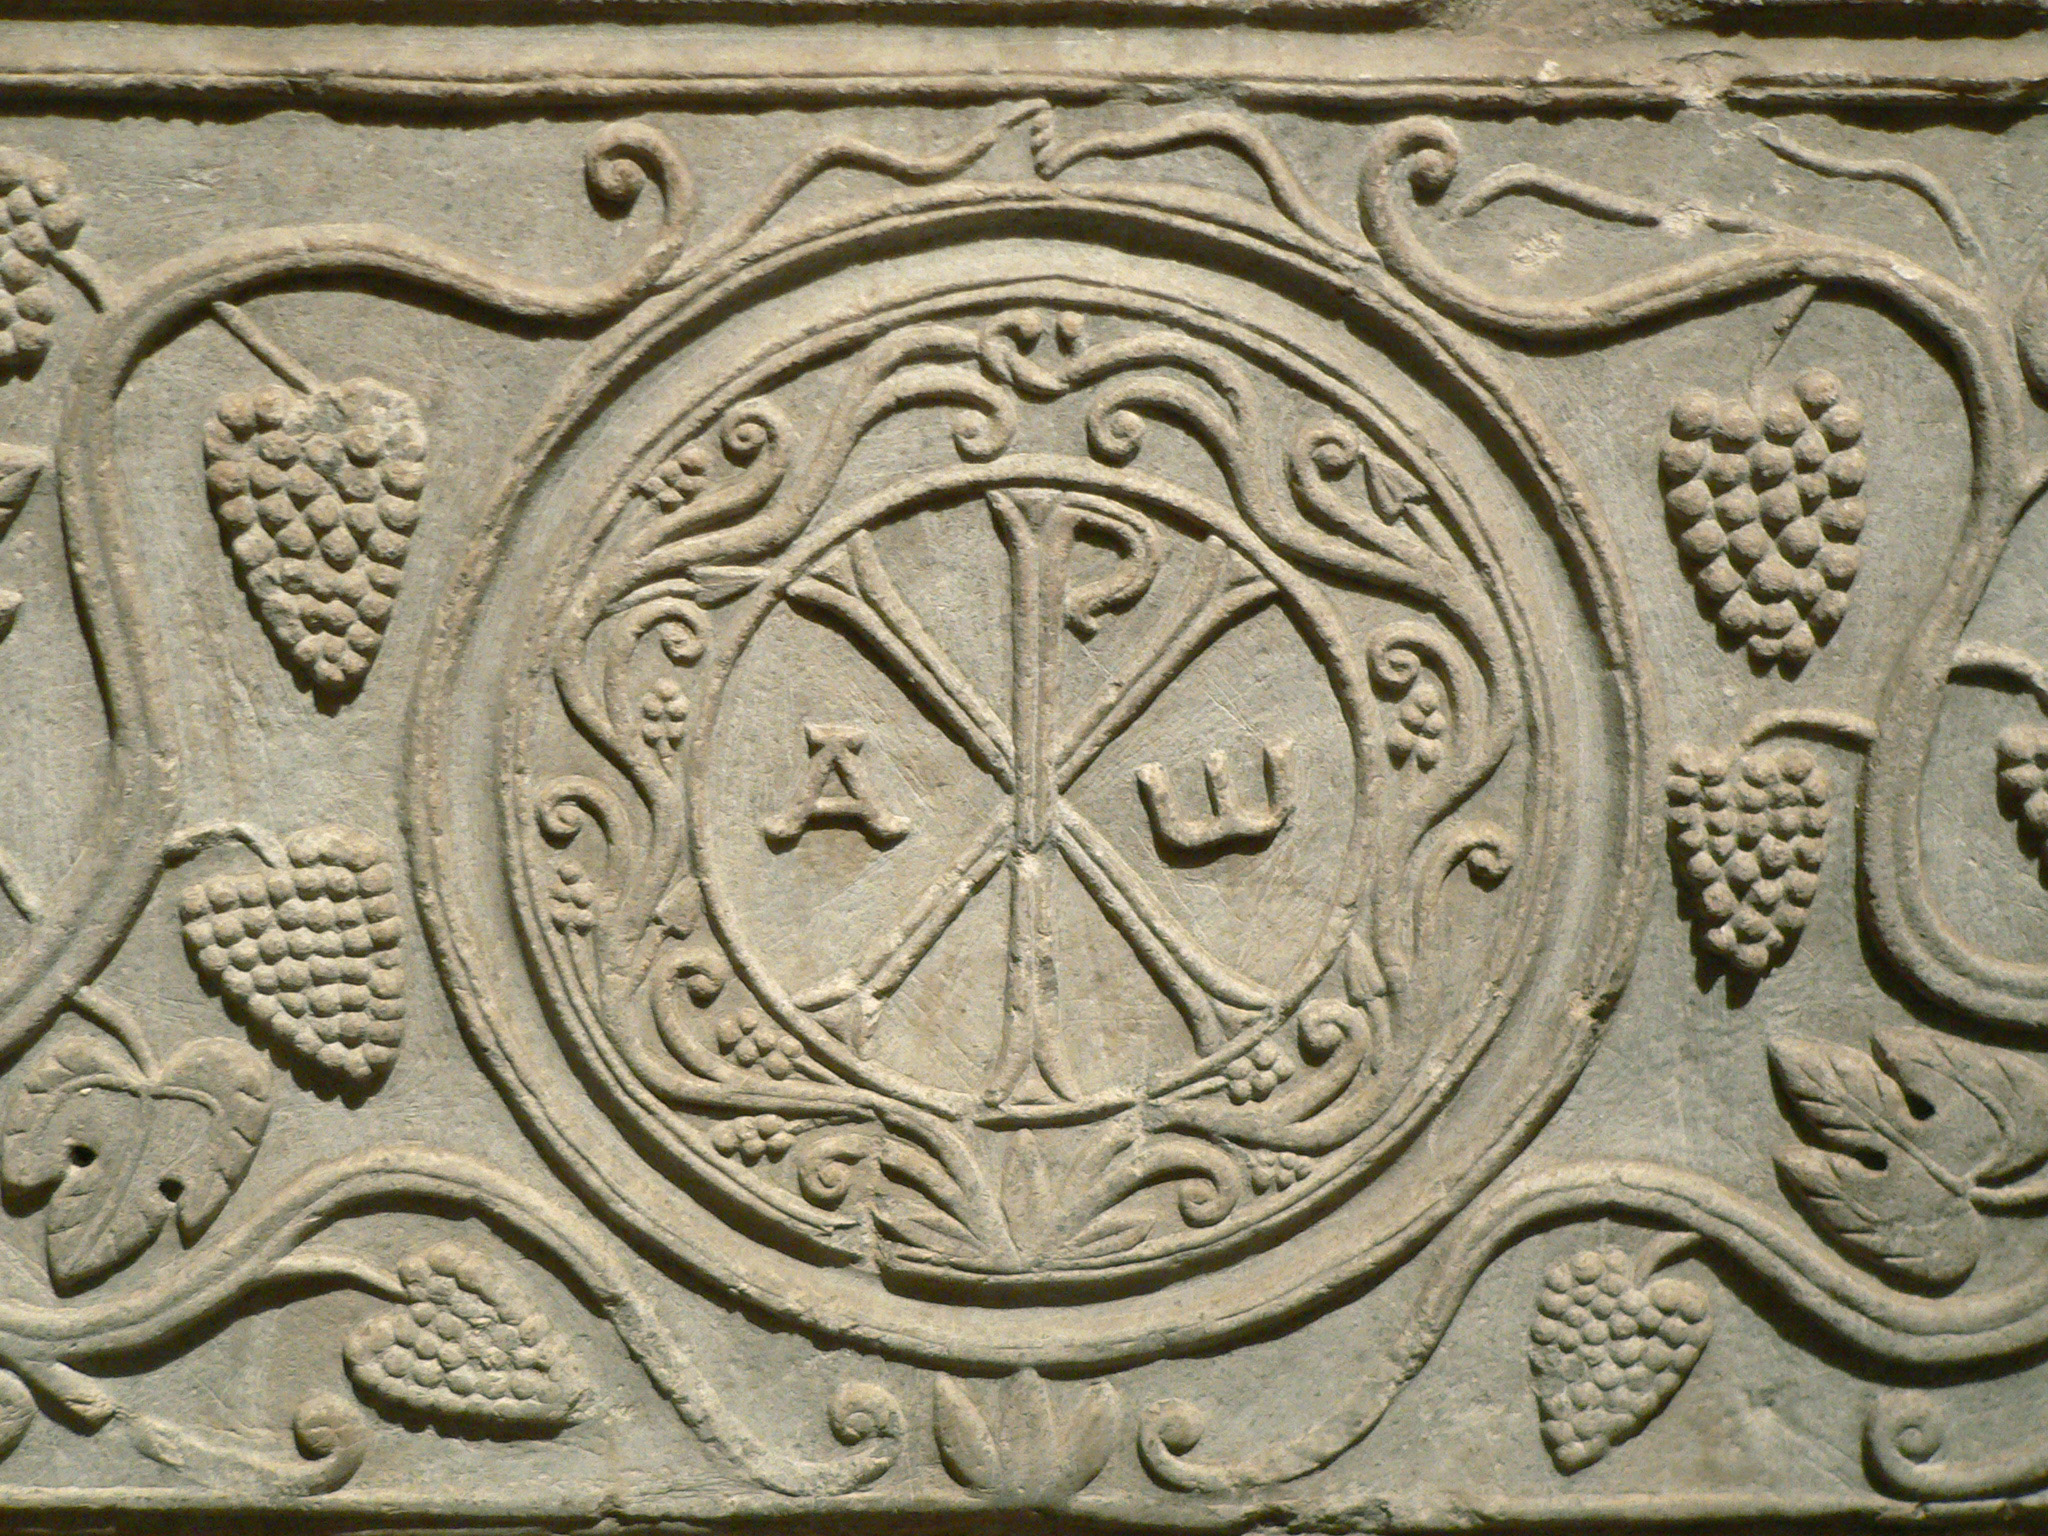 The monogram of Christ's name.